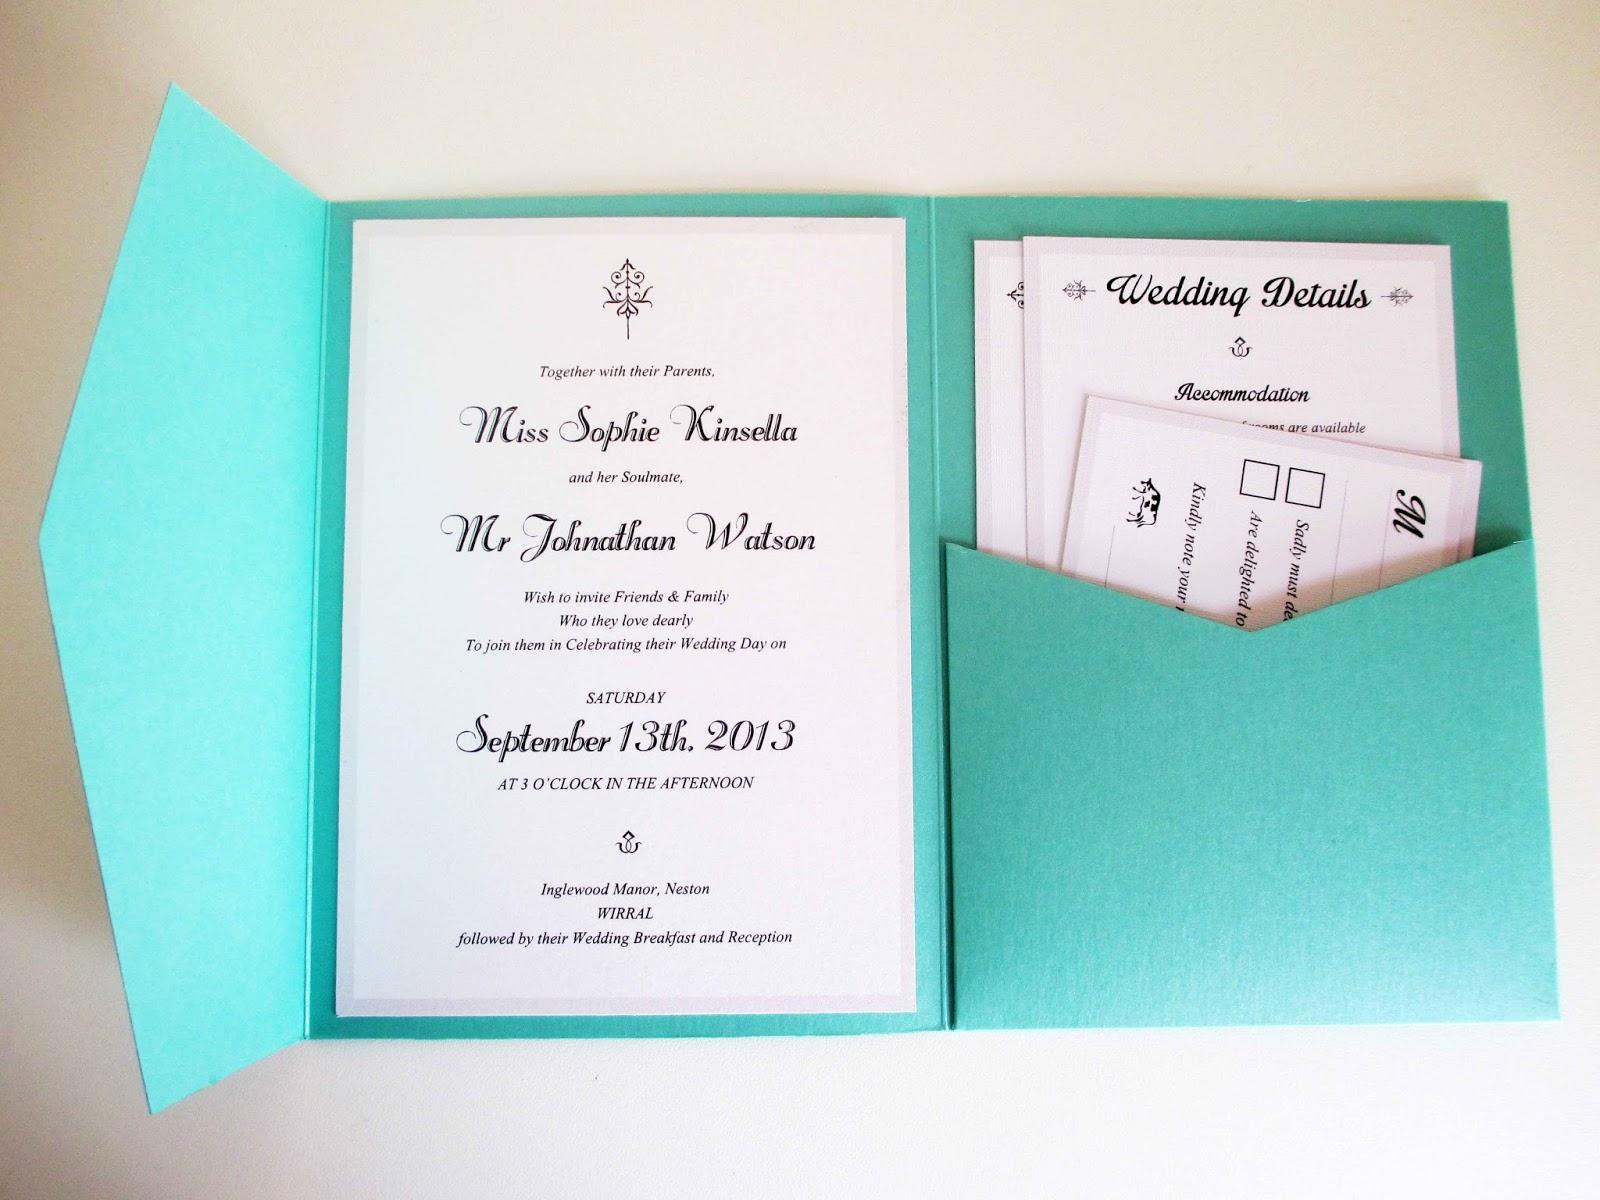 VanillaRetro Stationery: NEW PRODUCTS! Designer Pocketfold Invites...